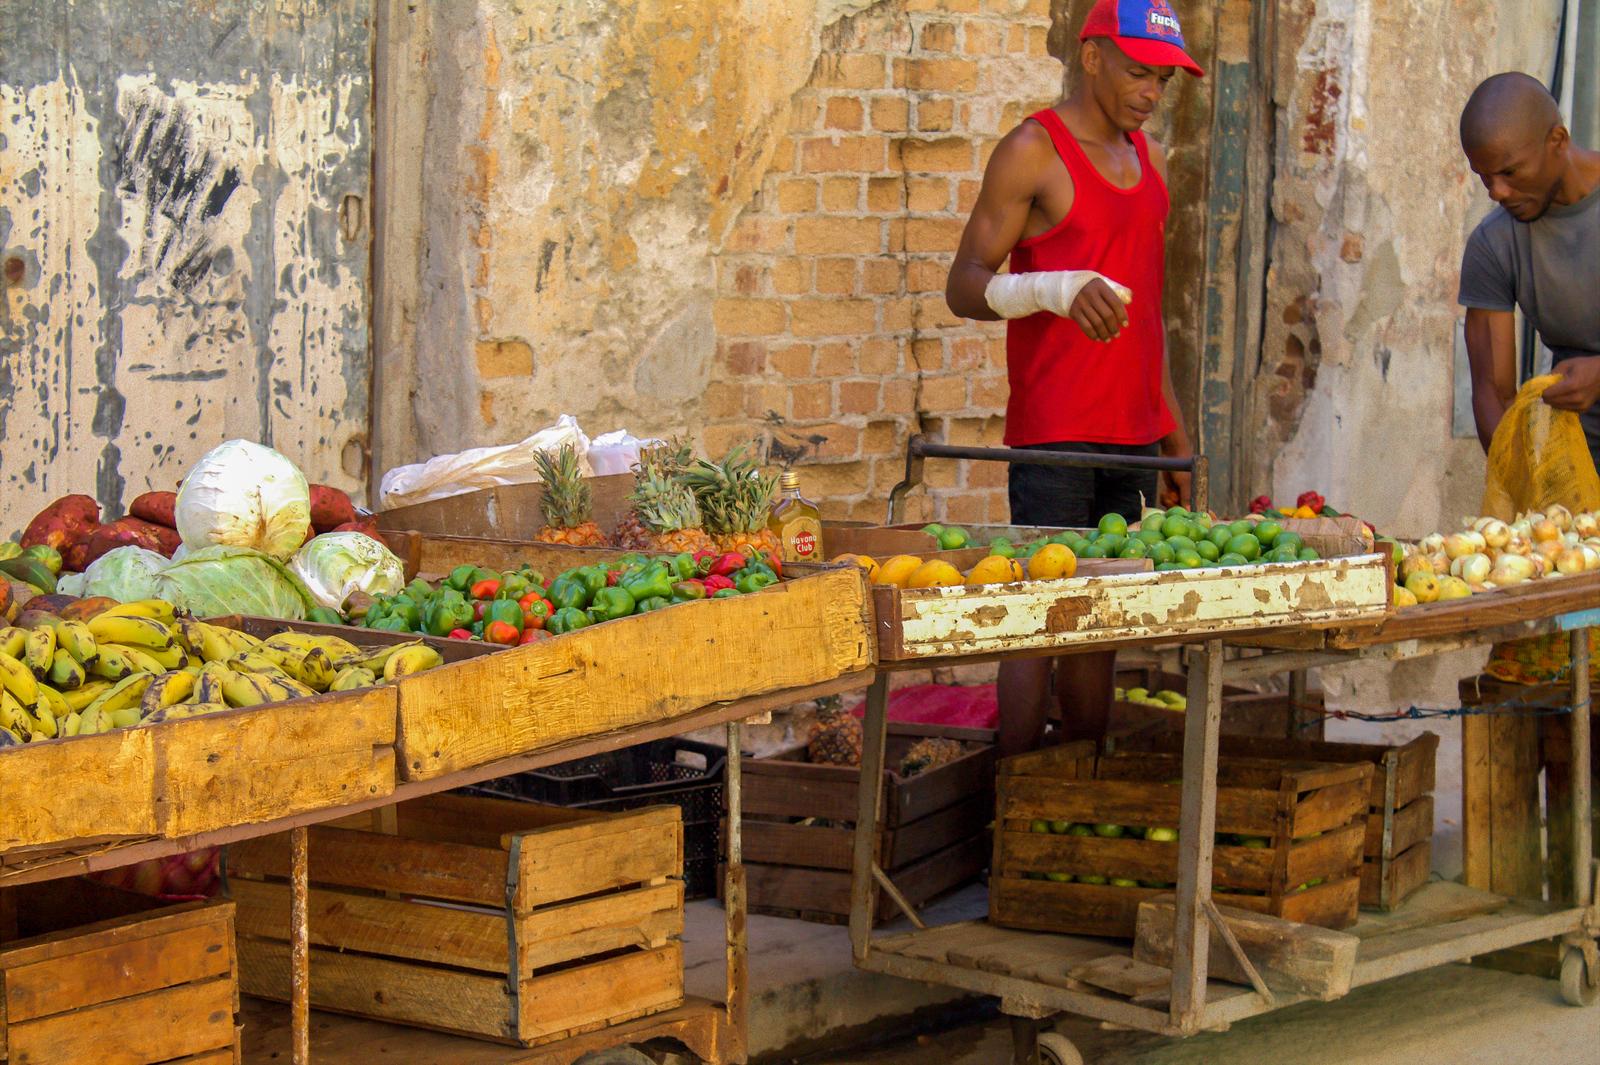 Cuban market, Havana